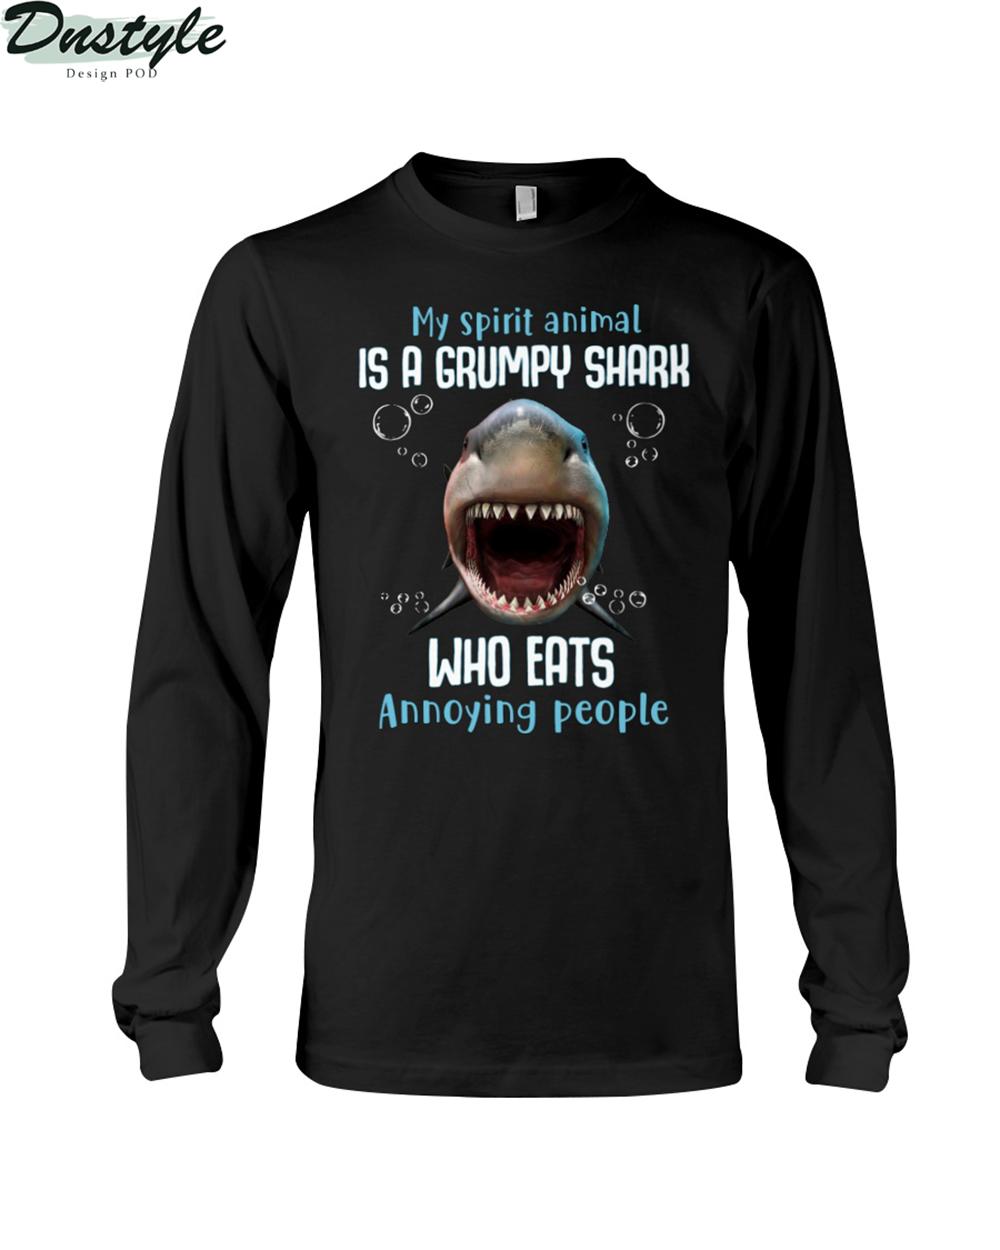 My spirit animal is a grumpy shark who eats annoying people long sleeve